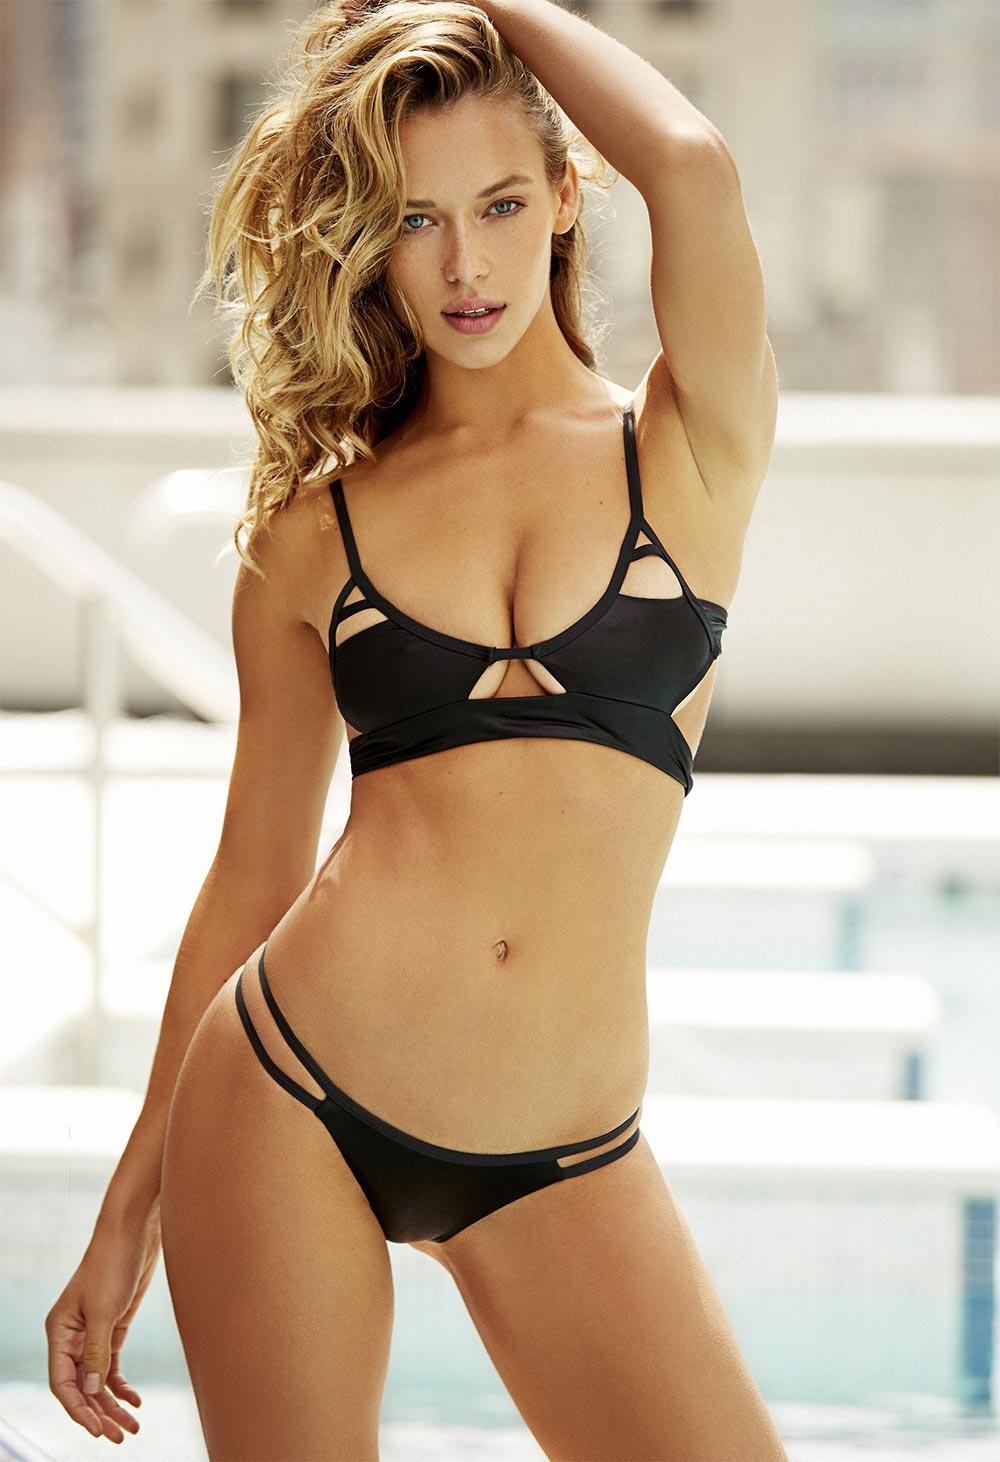 модель Хана Фергюсон model Hannah Ferguson